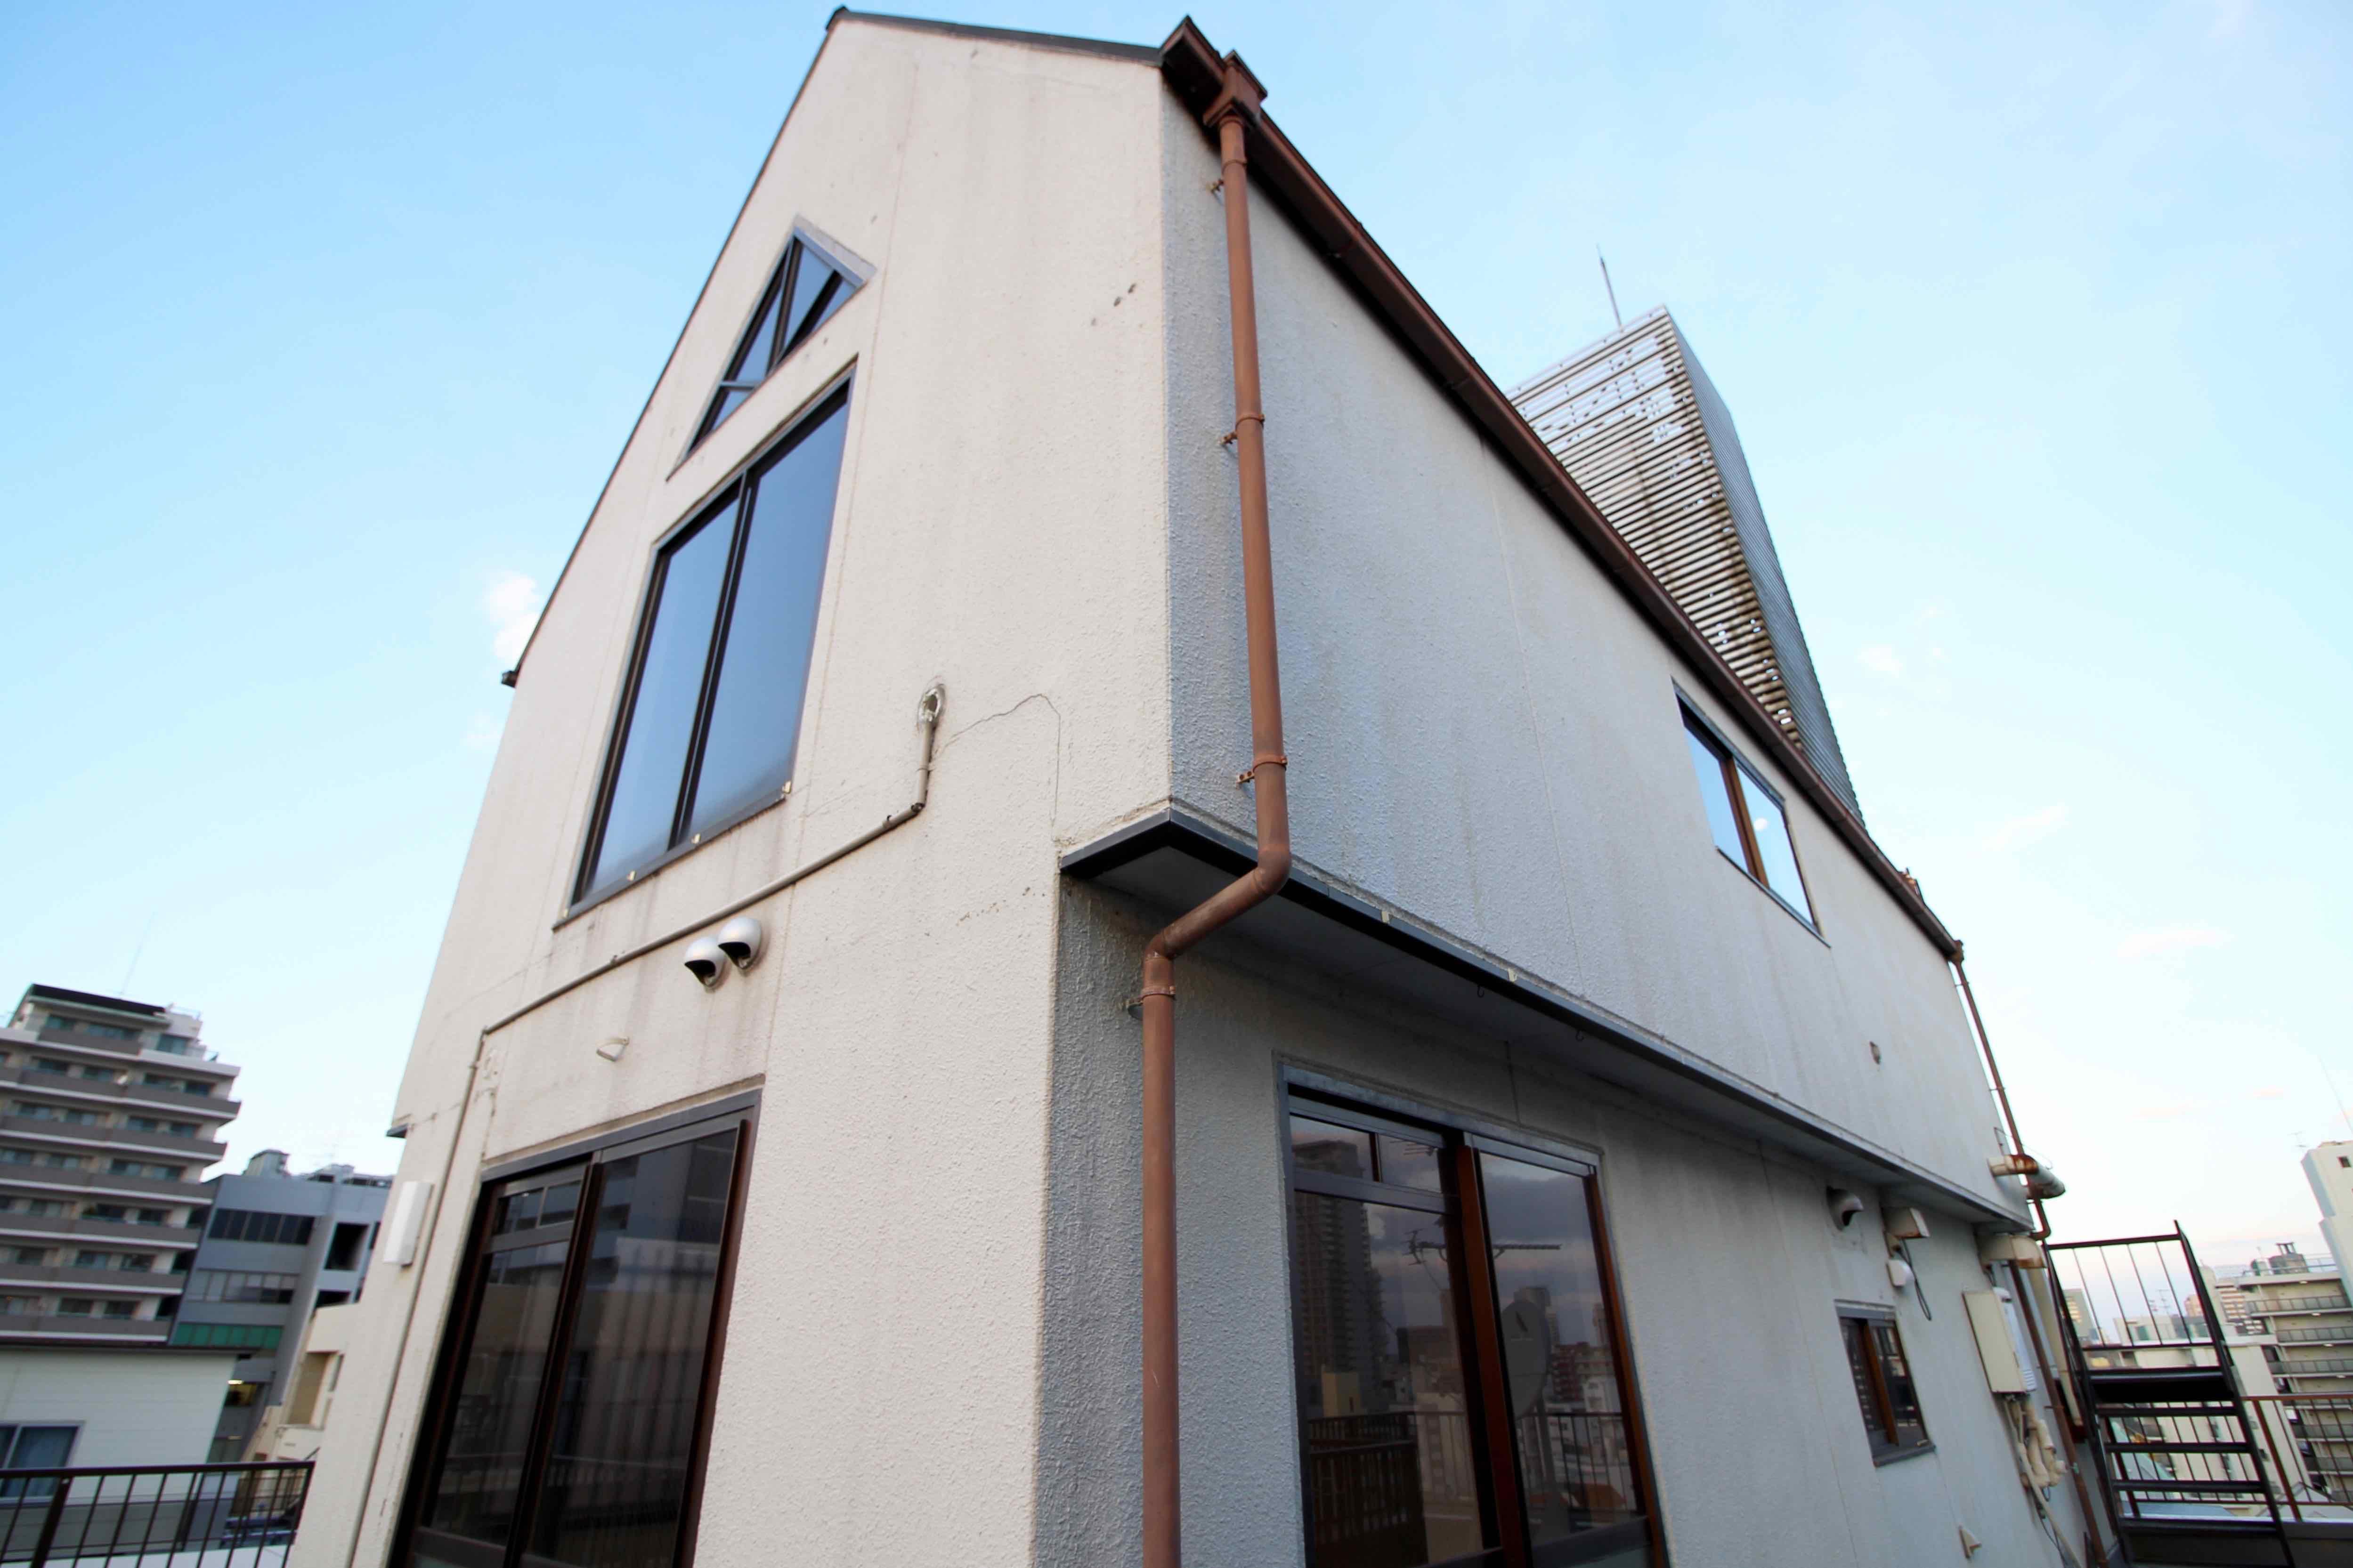 屋上の僕ん家 (神戸市中央区花隈町の物件) - 神戸R不動産